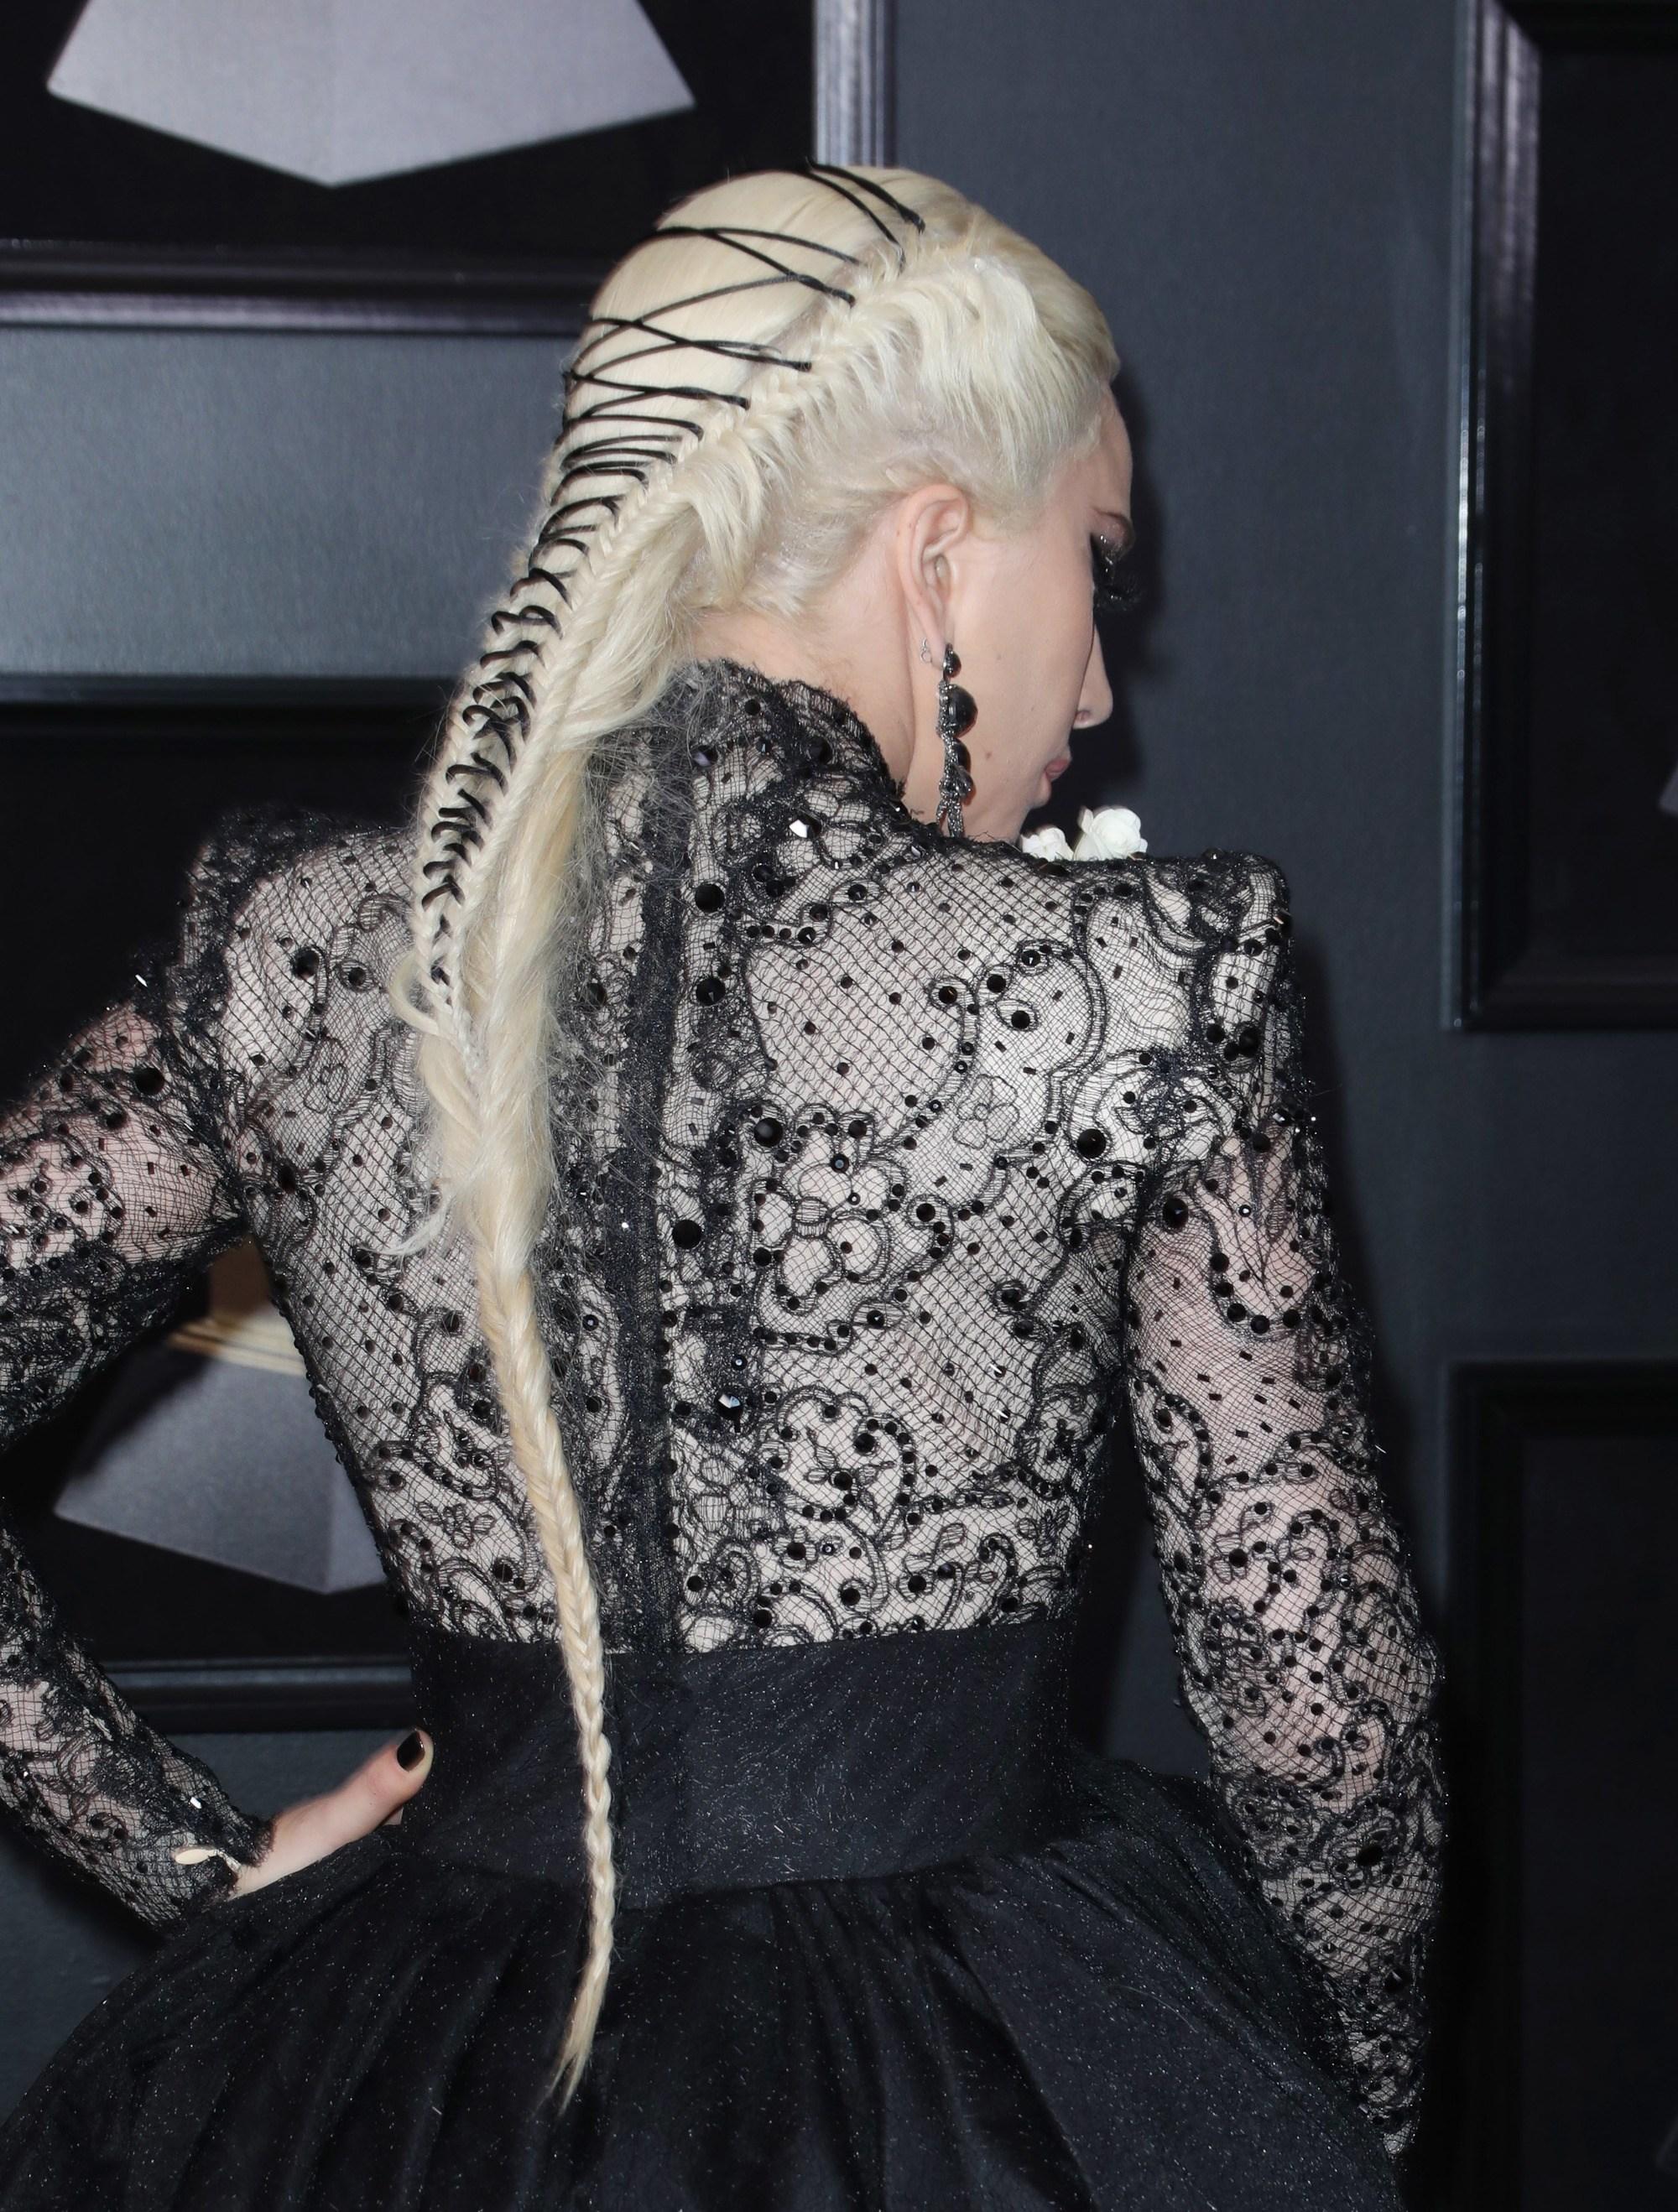 grammys 2018 lady gaga long bleach blonde ribbon braid